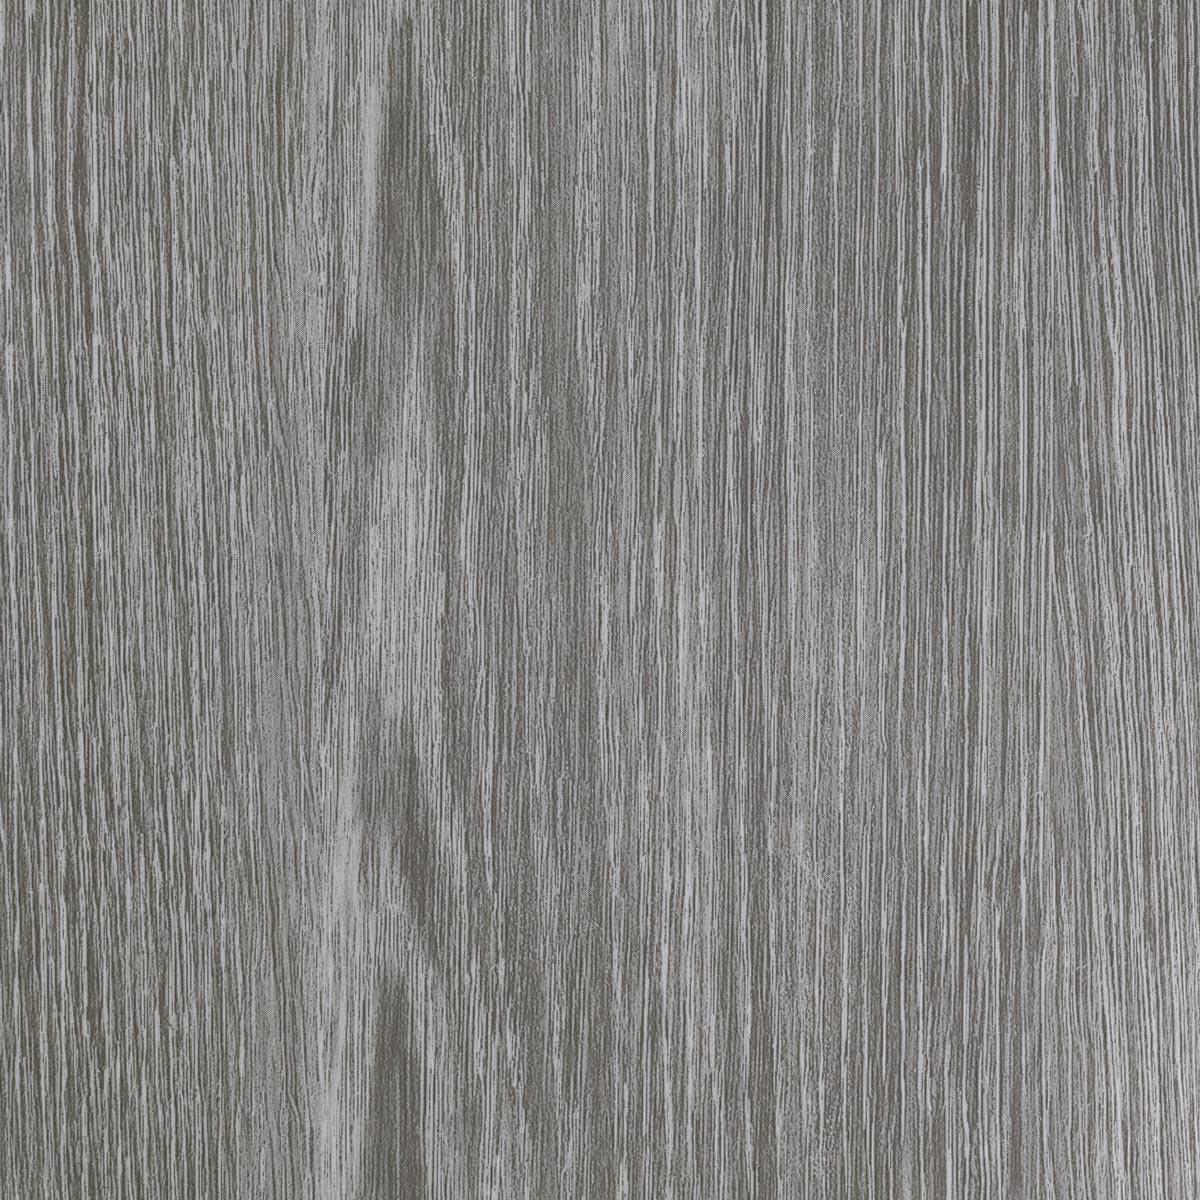 Woodec Rovere Cemento WC